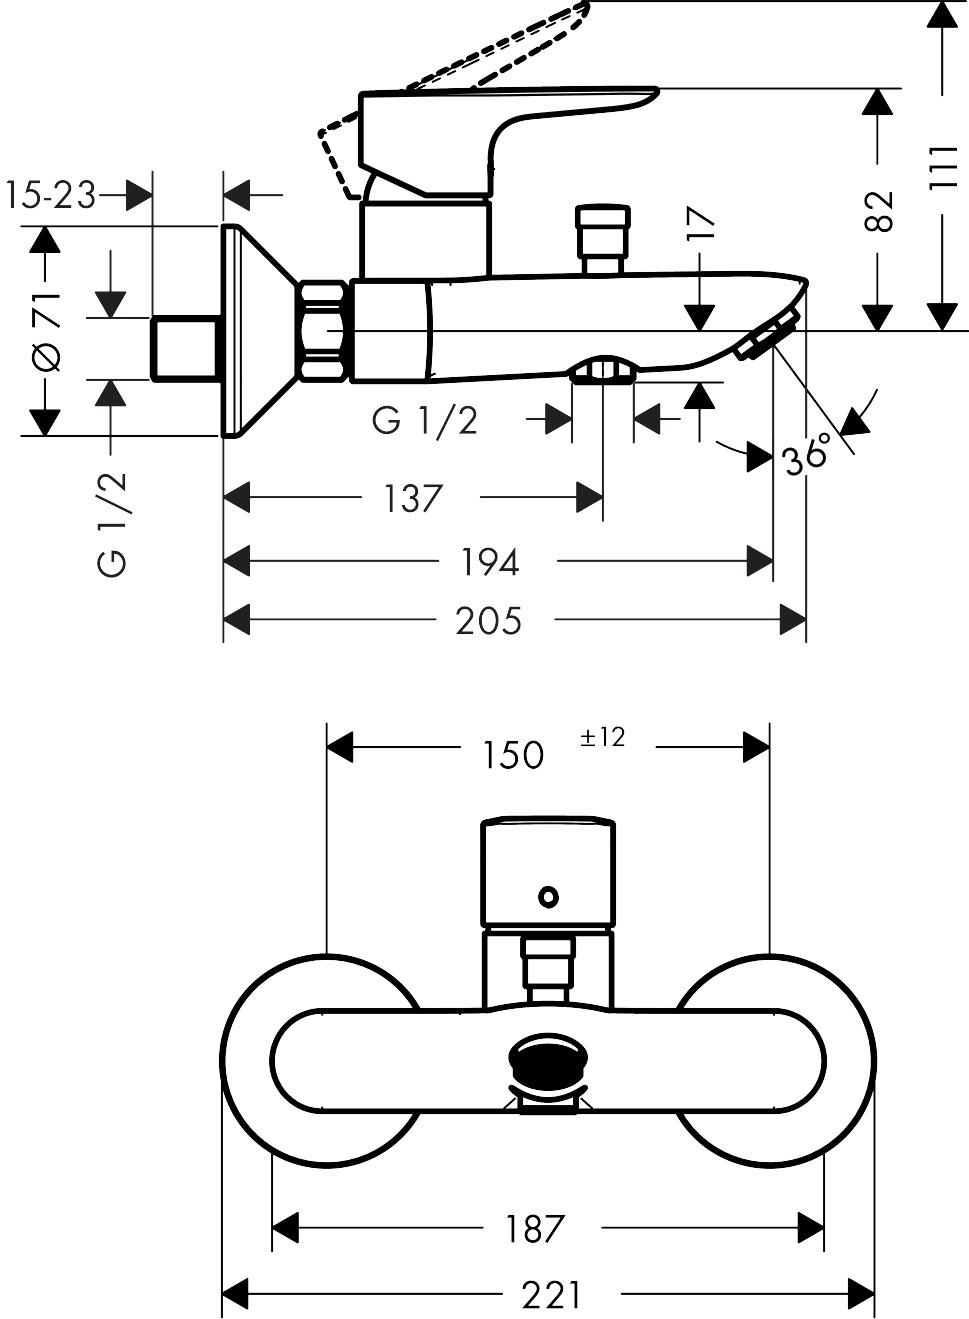 71740000 Talis E Single lever manual bath mixer for exposed installation